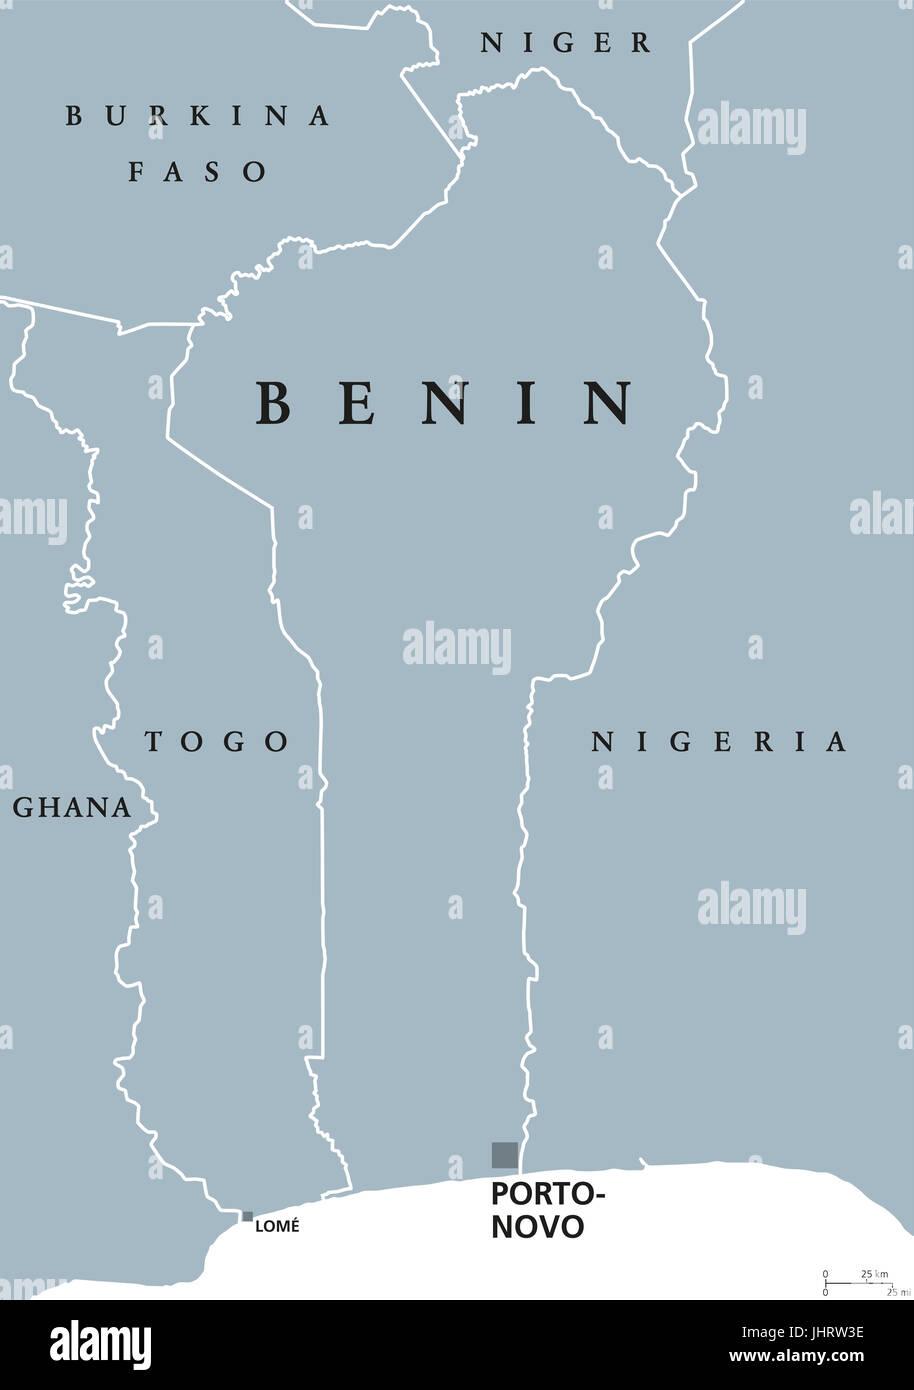 Benin political map with capital Porto-Novo. Formerly Dahomey,a ...